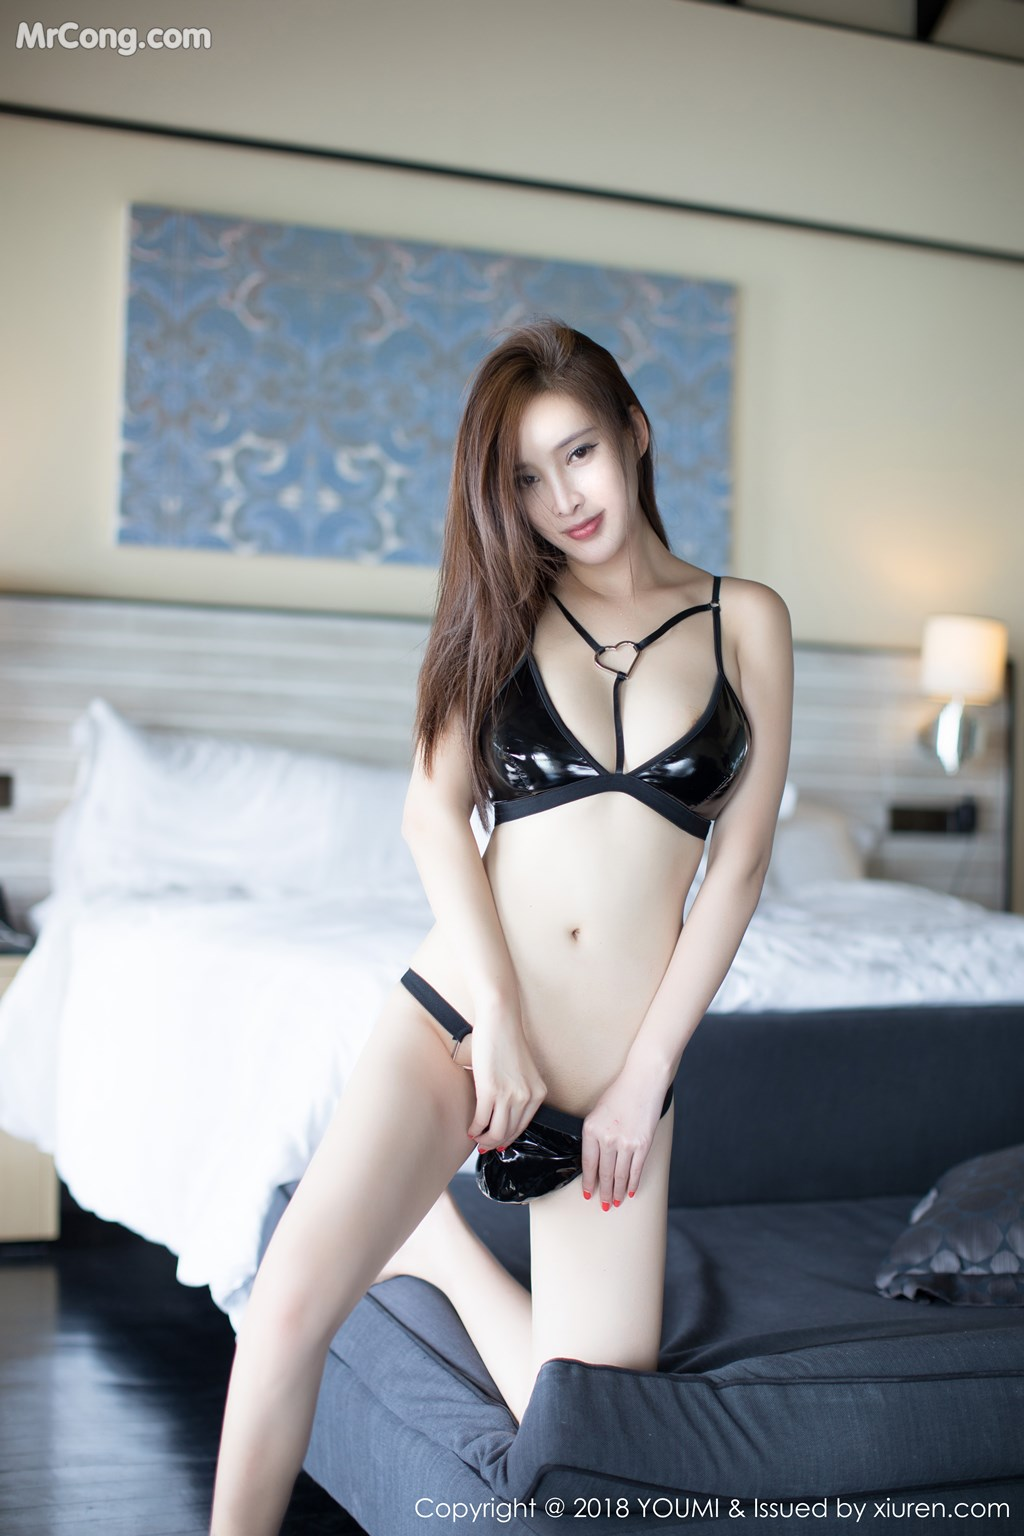 Image YouMi-Vol.237-Tu-Fei-Yuan-Ai-Cuo-Qiong-MrCong.com-001 in post YouMi Vol.237: Người mẫu 奶瓶土肥圆 (46 ảnh)